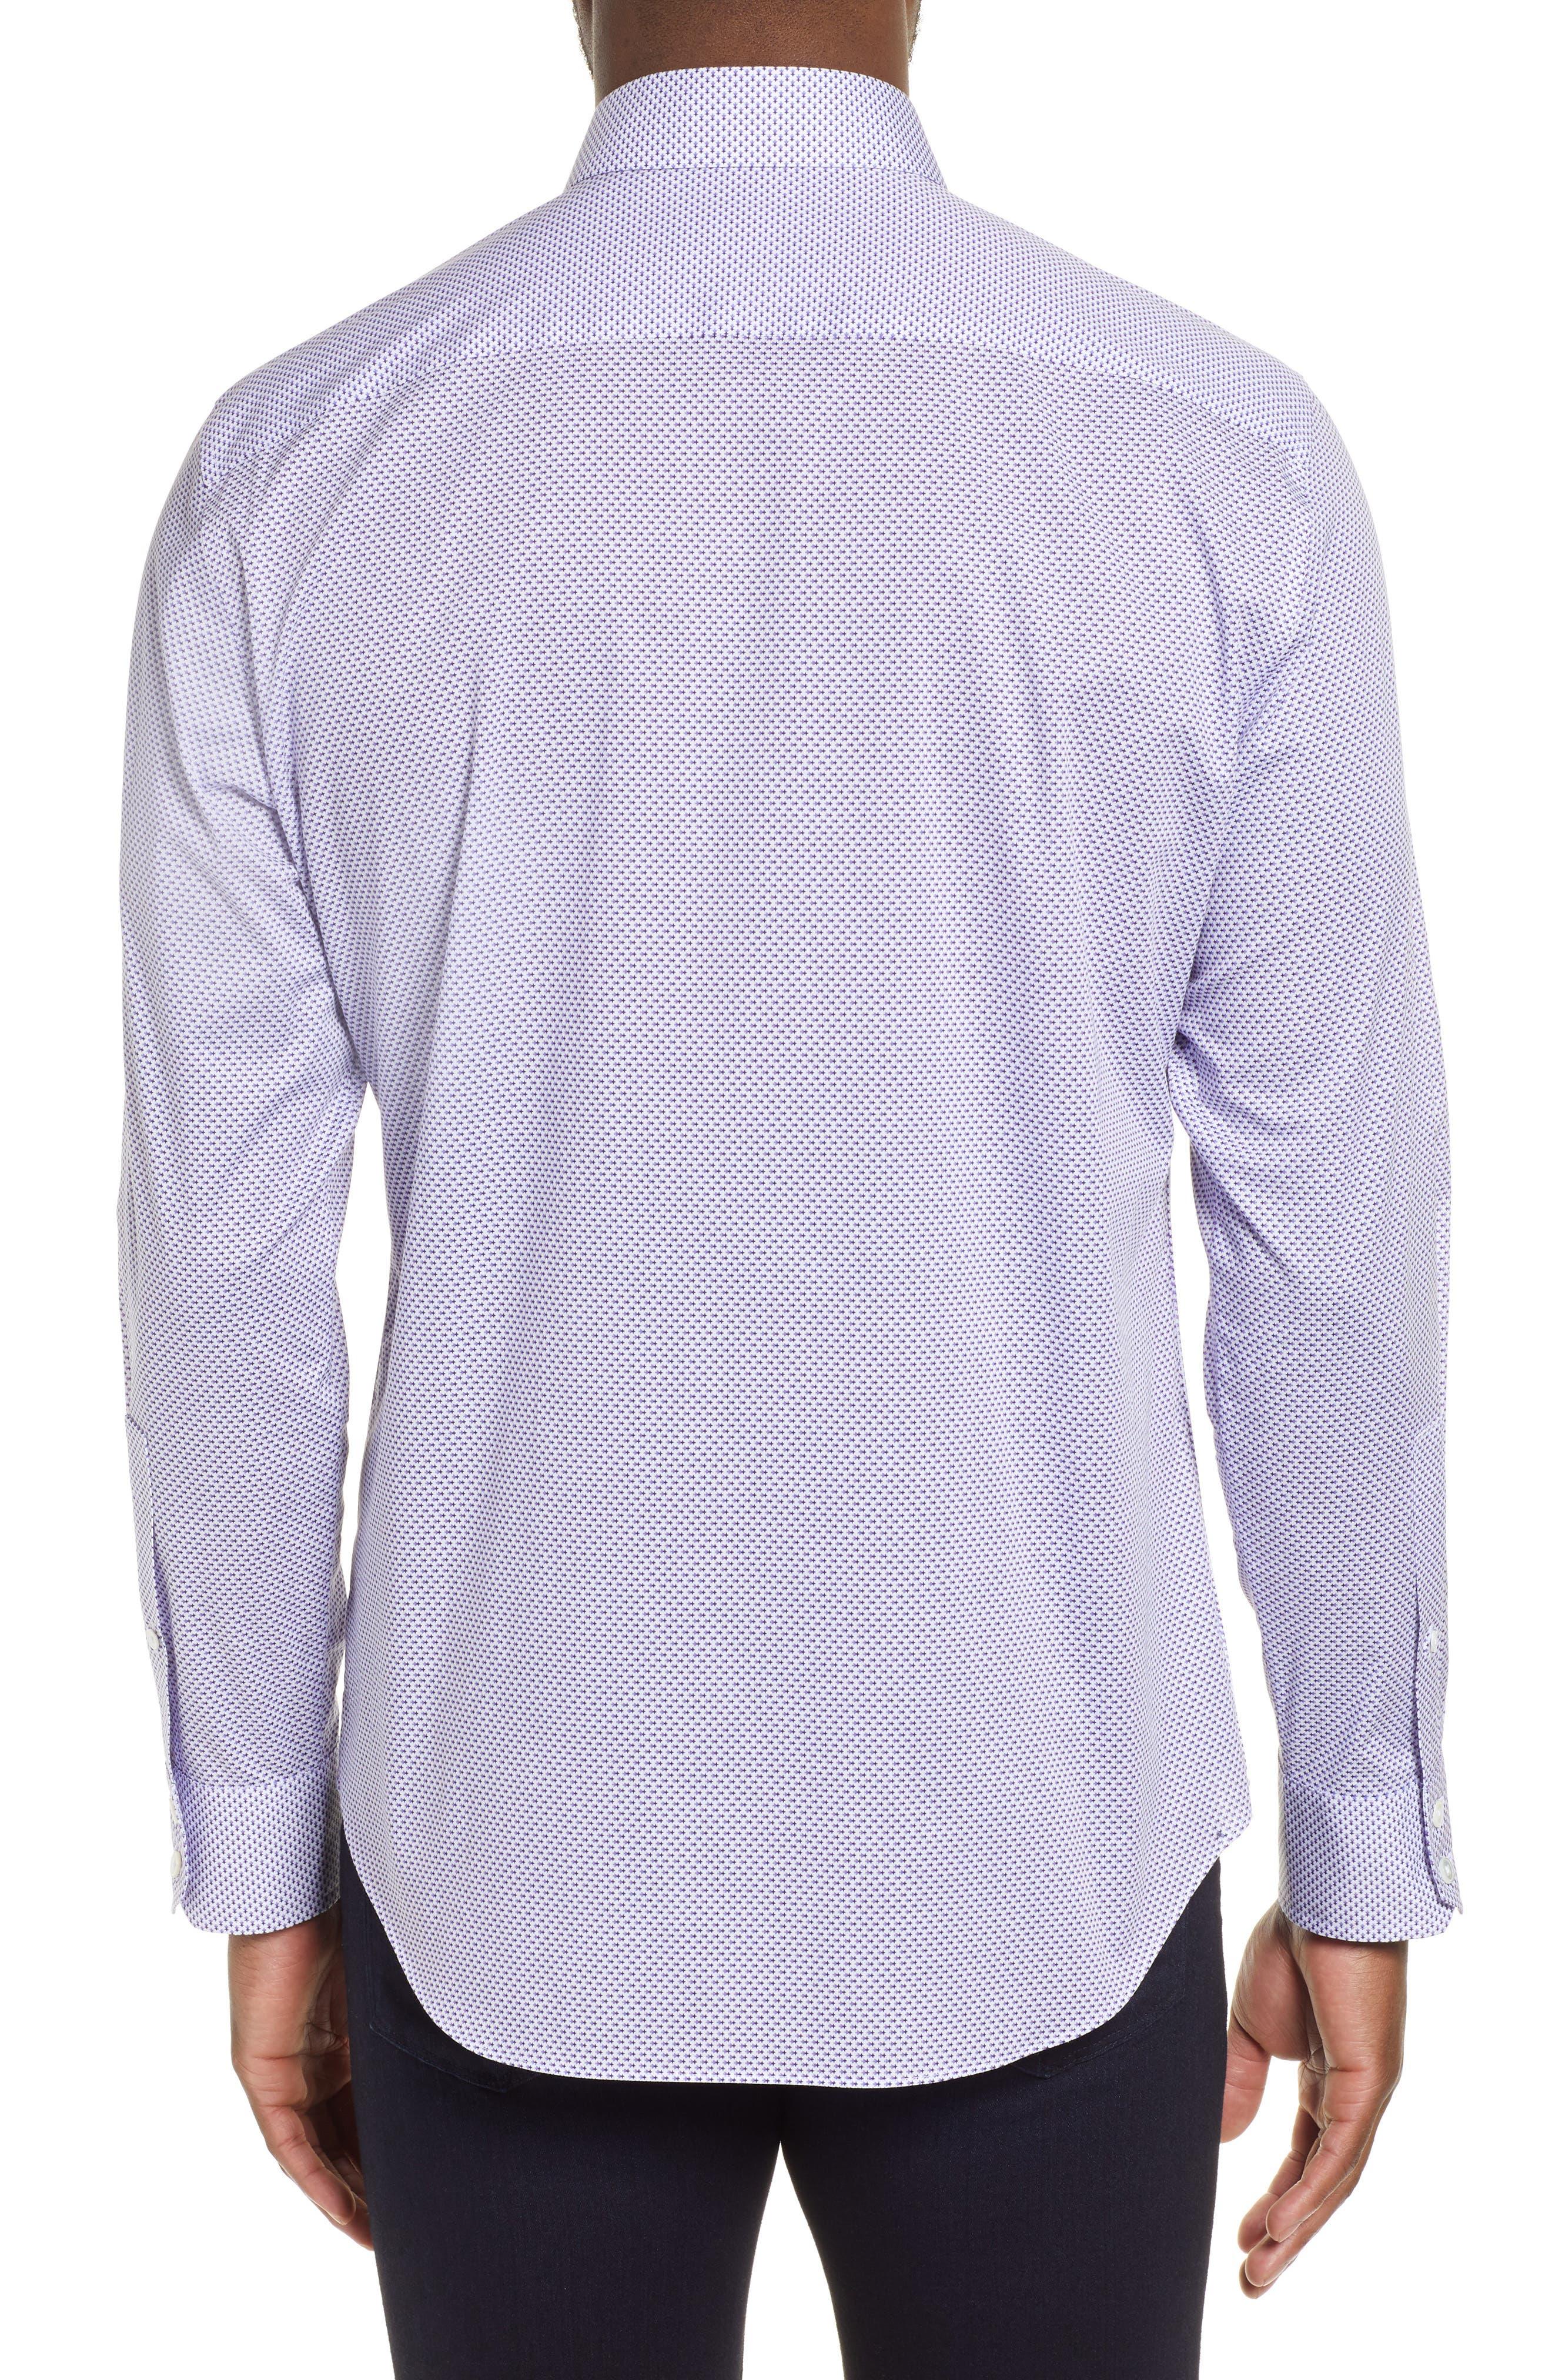 ZACHARY PRELL, Wilson Regular Fit Micro Print Sport Shirt, Alternate thumbnail 3, color, PURPLE